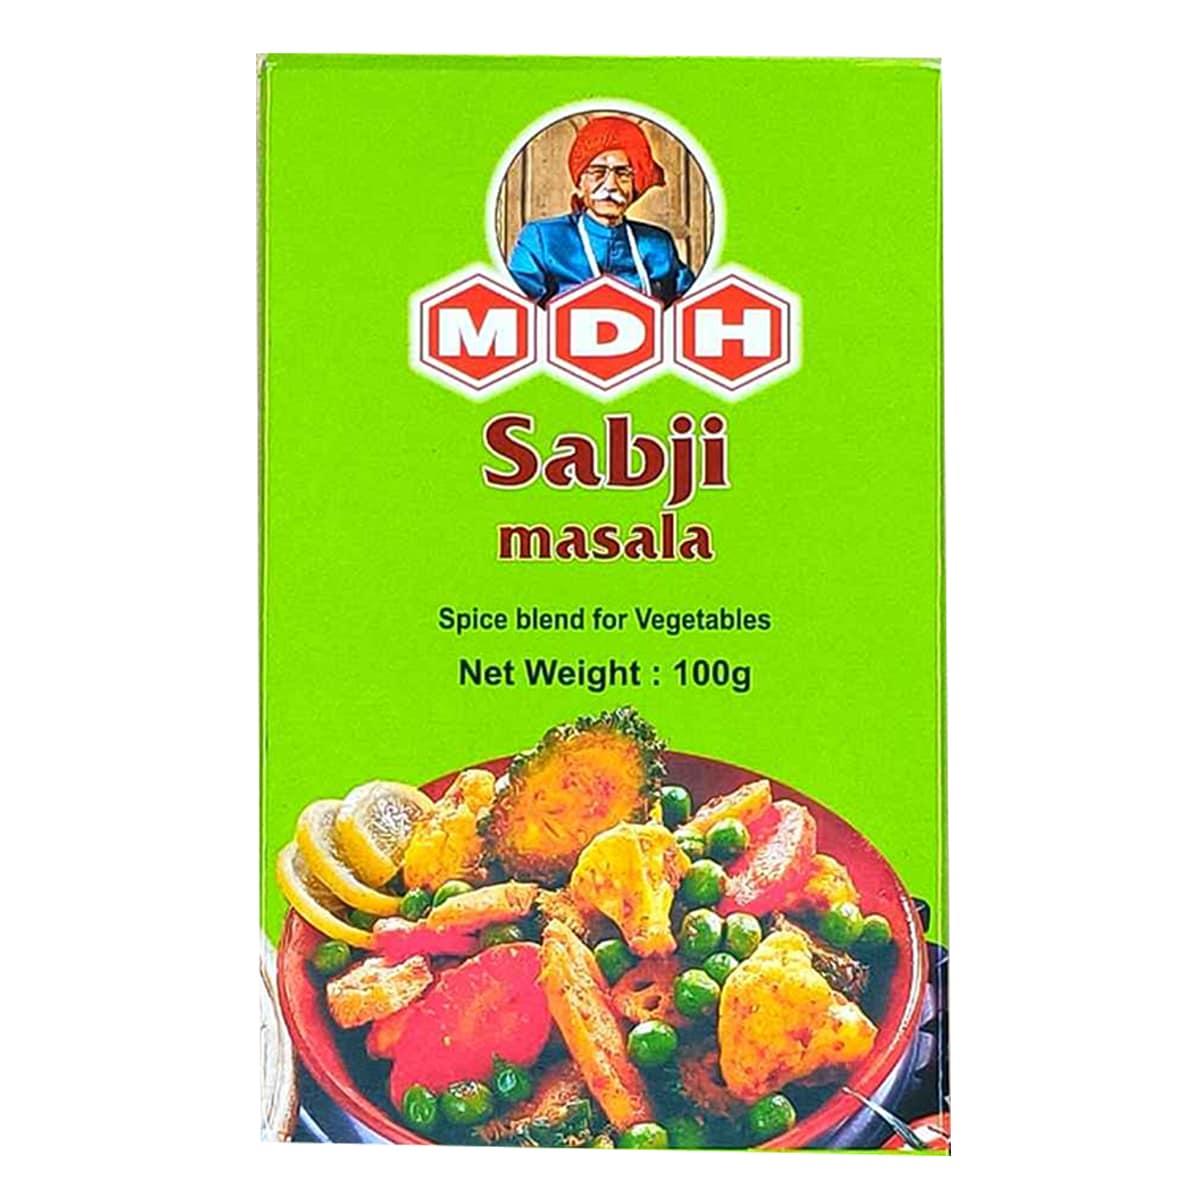 Buy MDH Sabji Masala - 100 gm